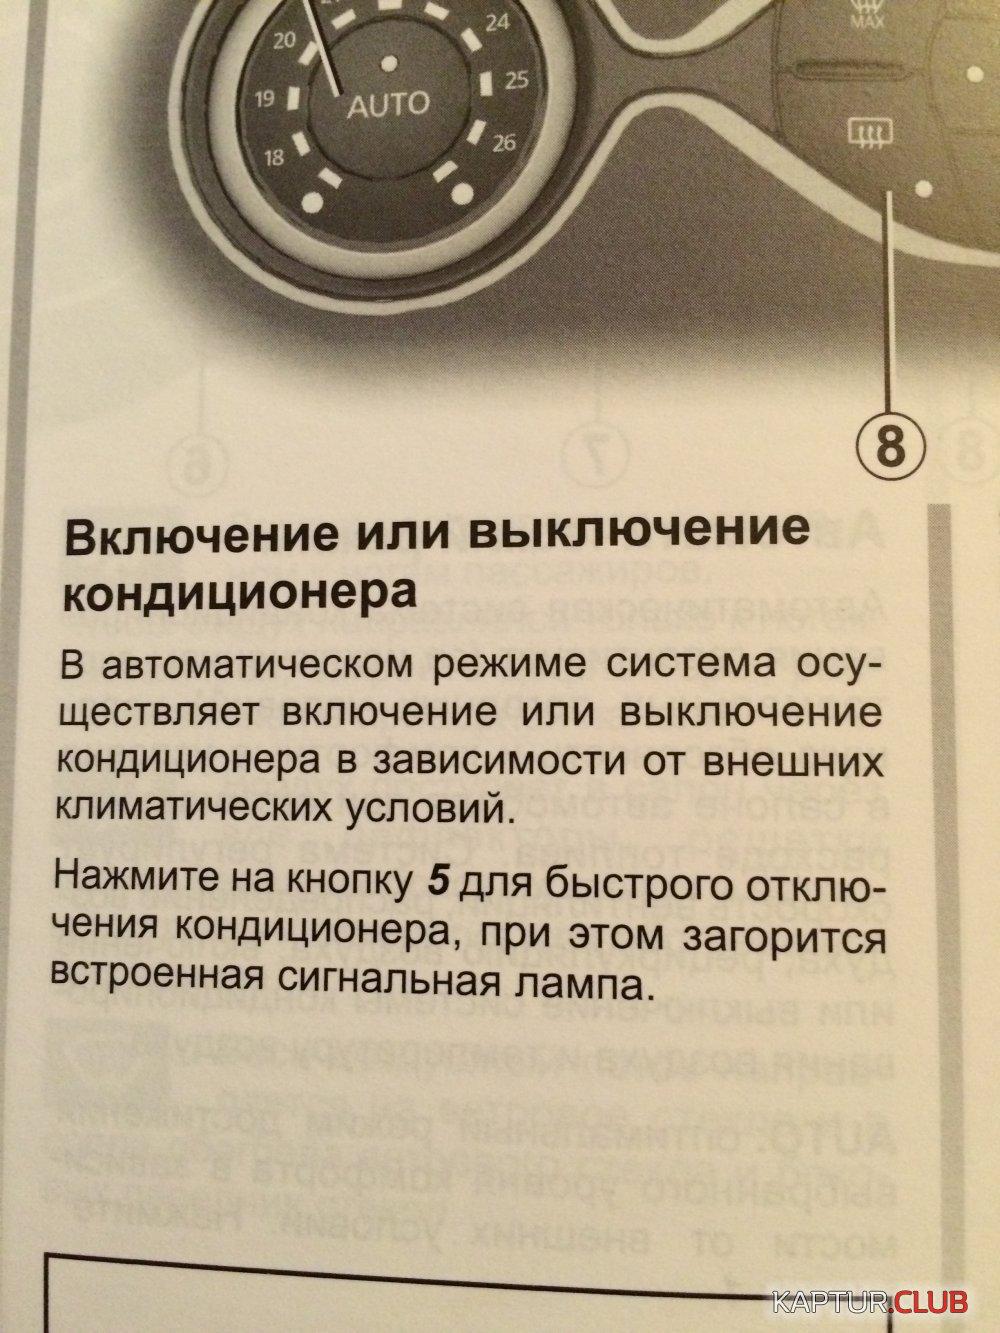 image.jpeg | Рено Каптур Клуб Россия | Форум KAPTUR.club